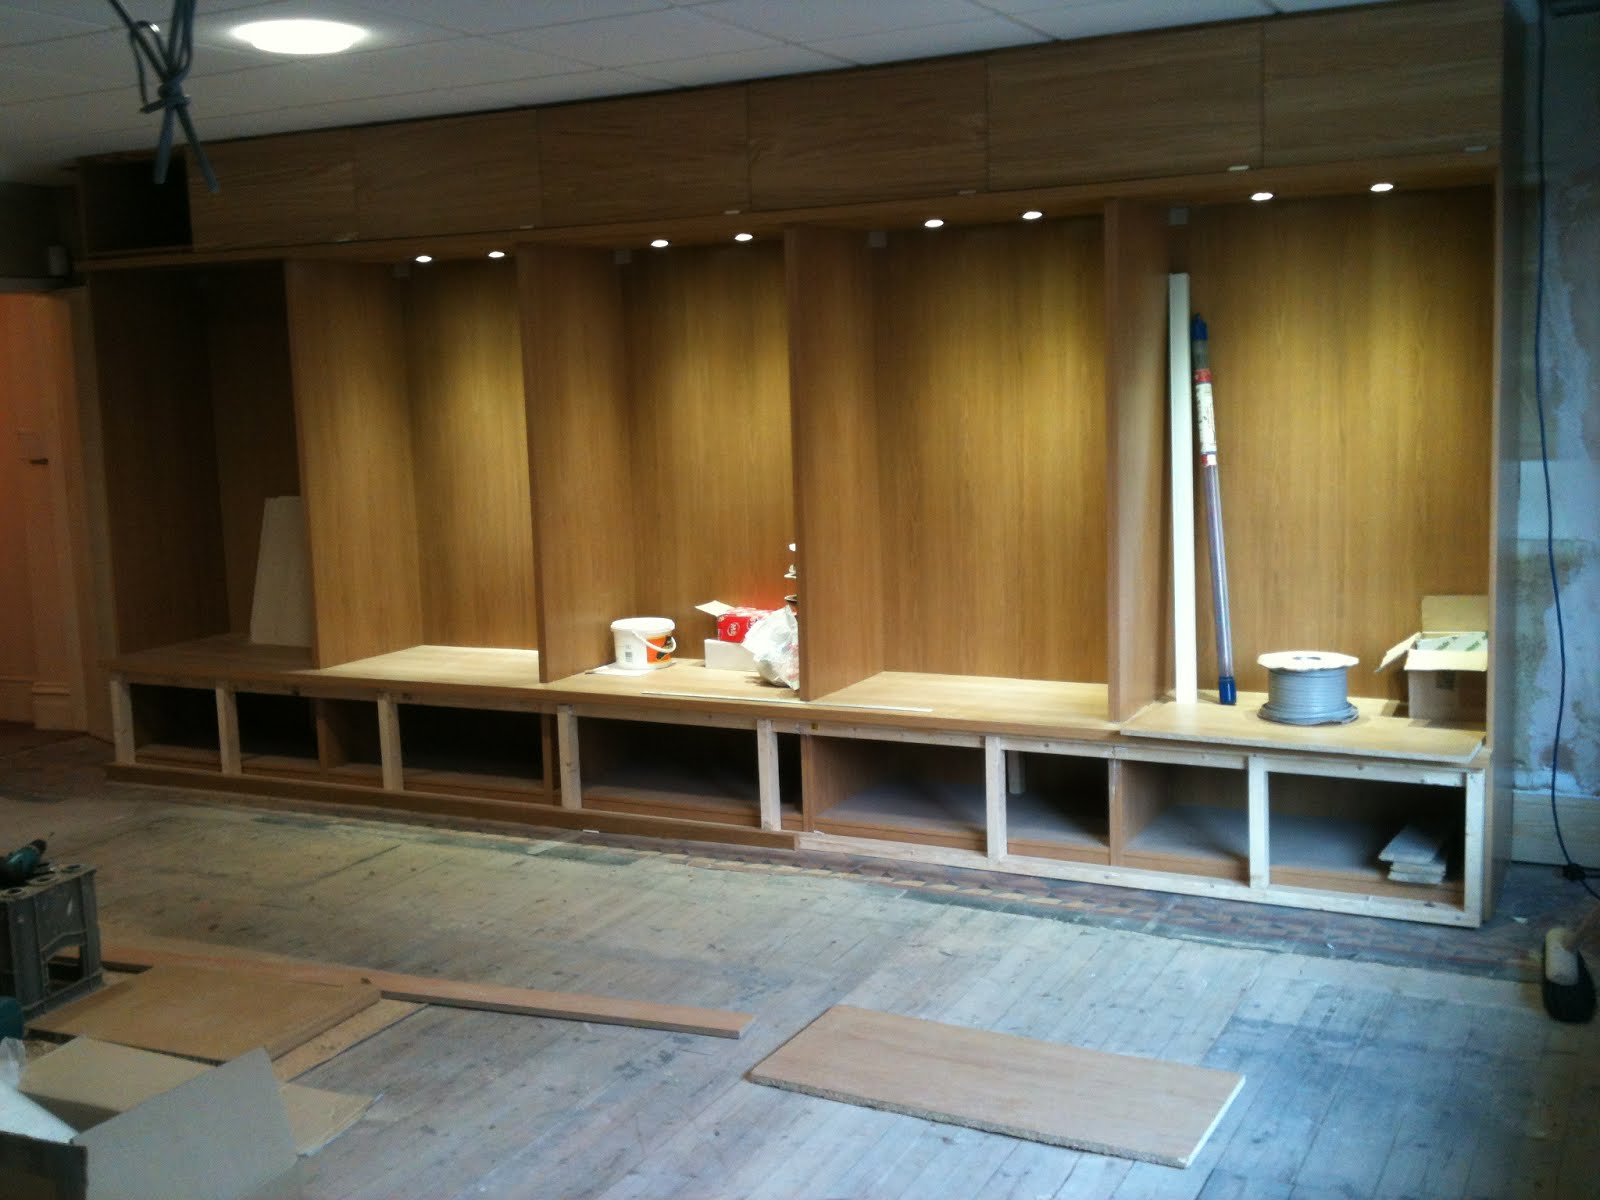 Stolmen Bed Hack Pax Wardrobe As Jewellery Shop Display Cabinets Home